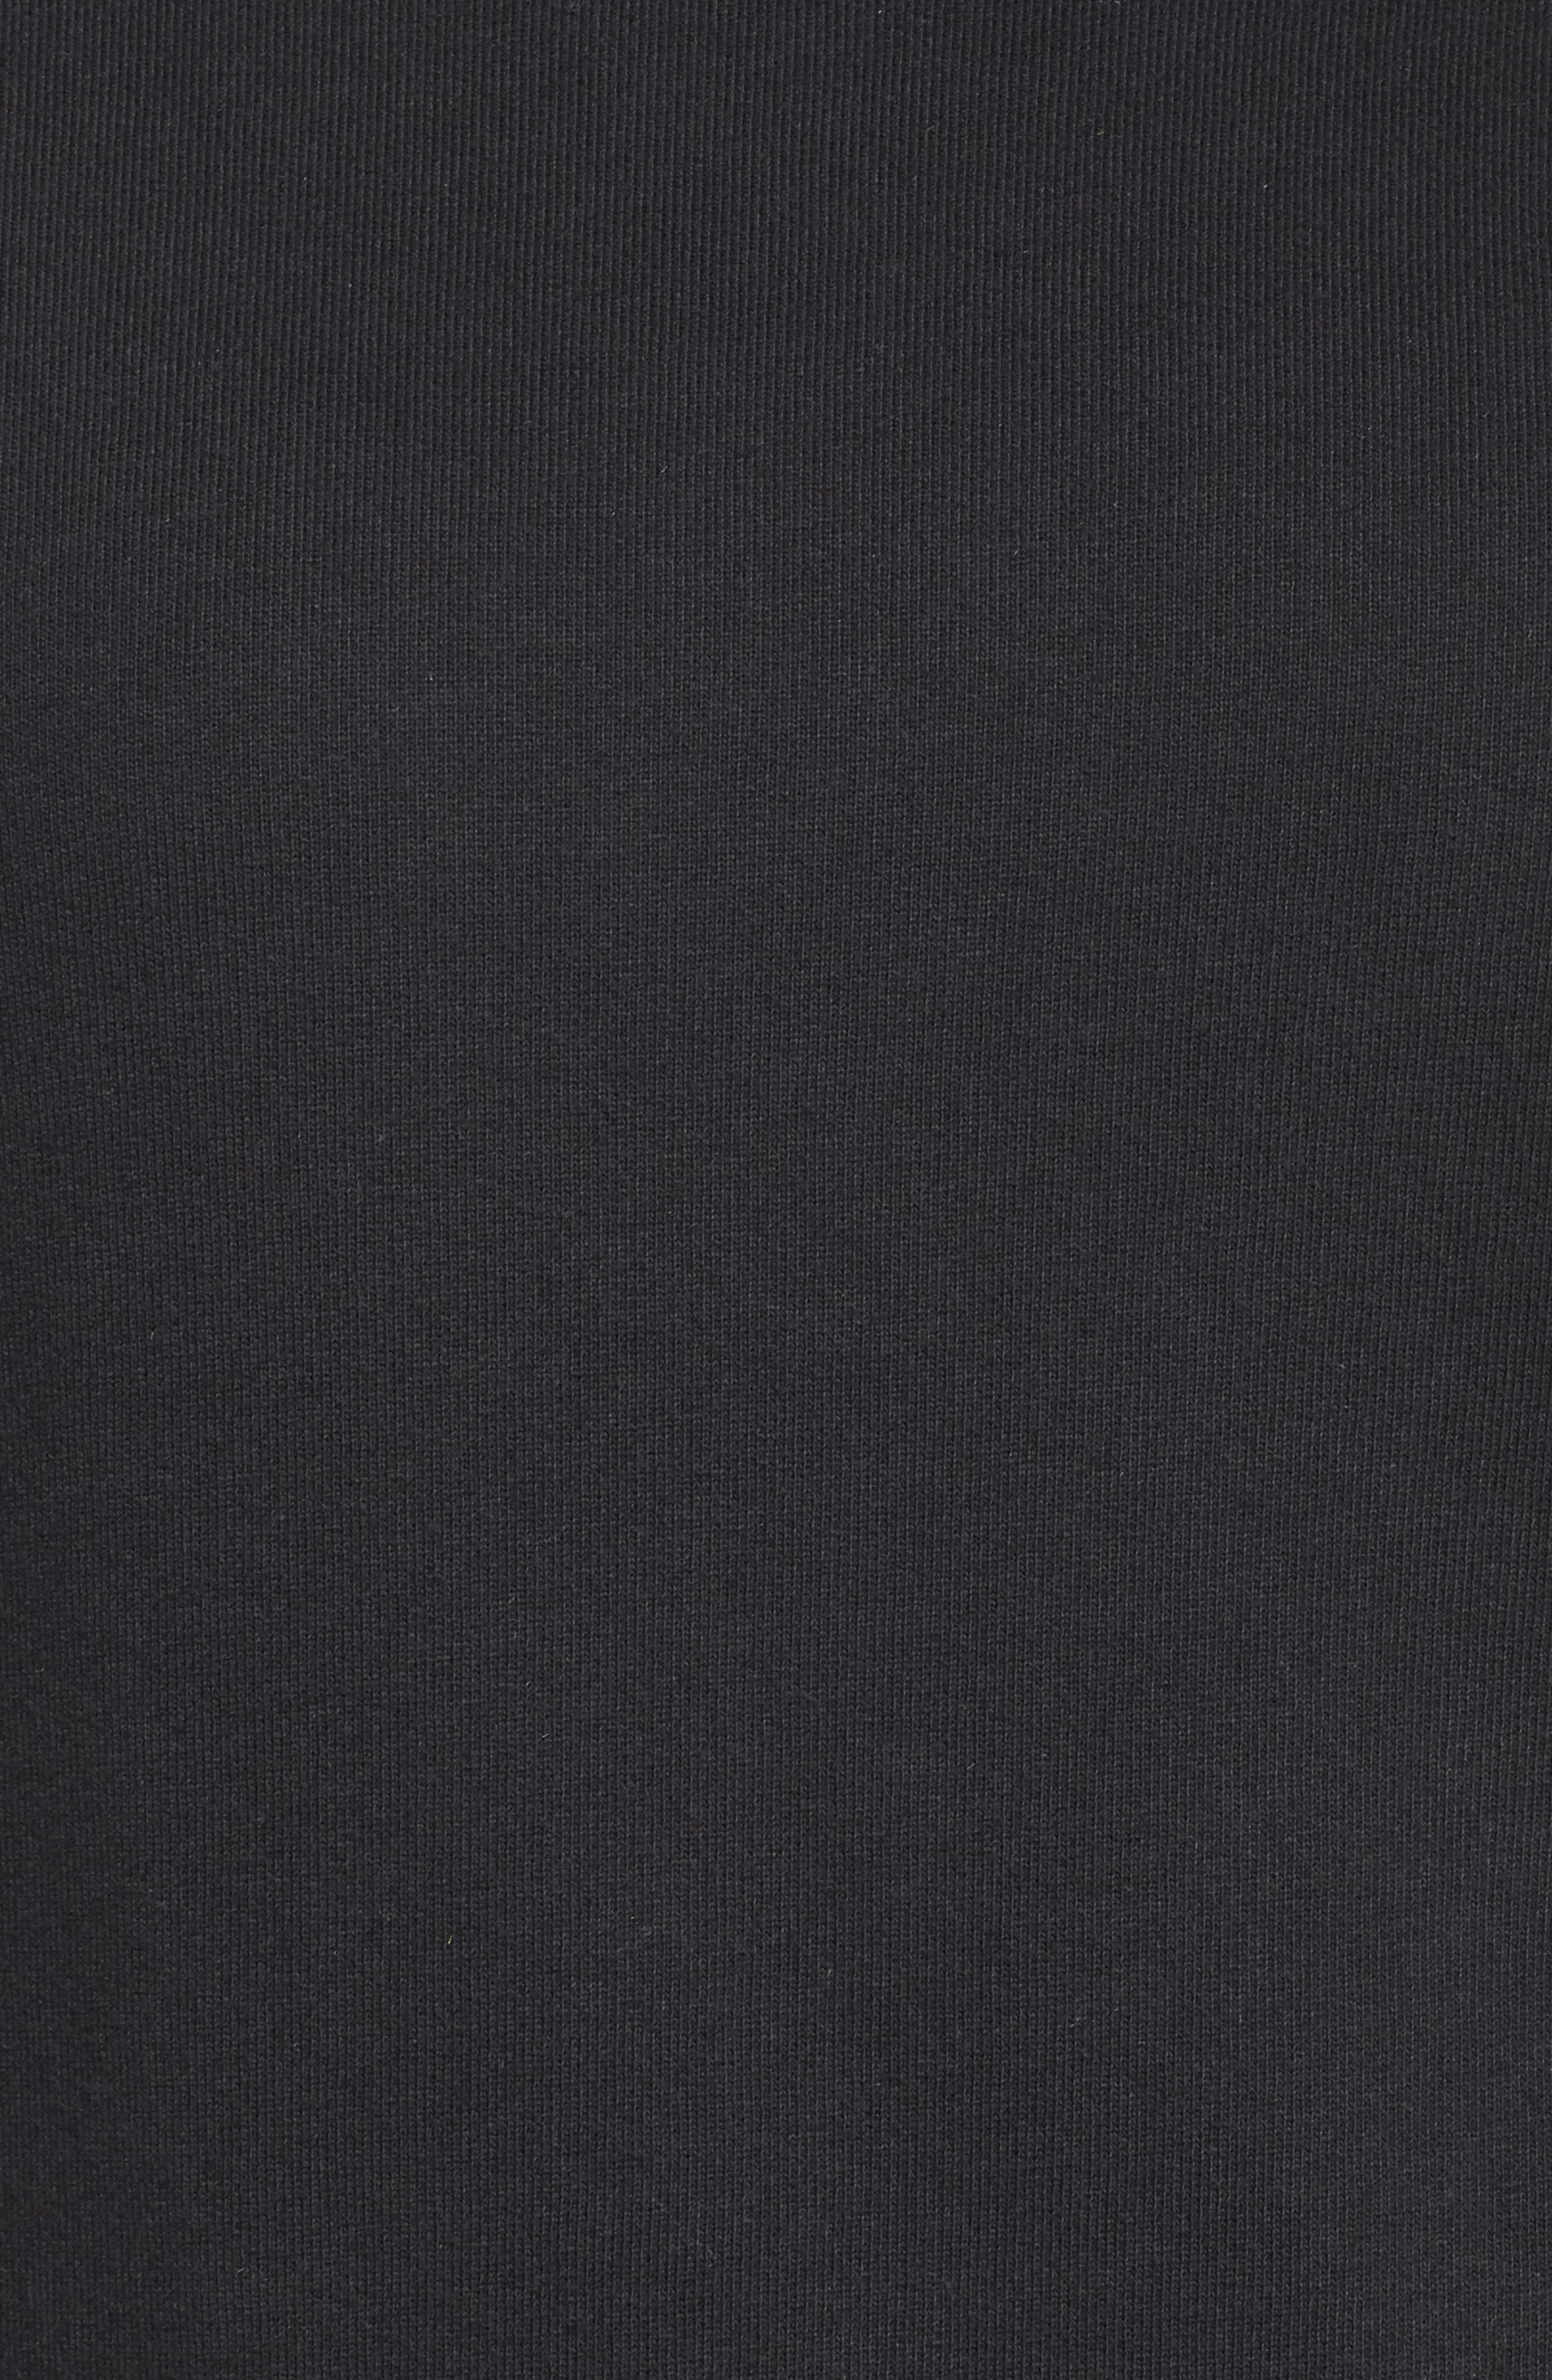 NFL New Orleans Saints Sunday Hoodie,                             Alternate thumbnail 6, color,                             True Black